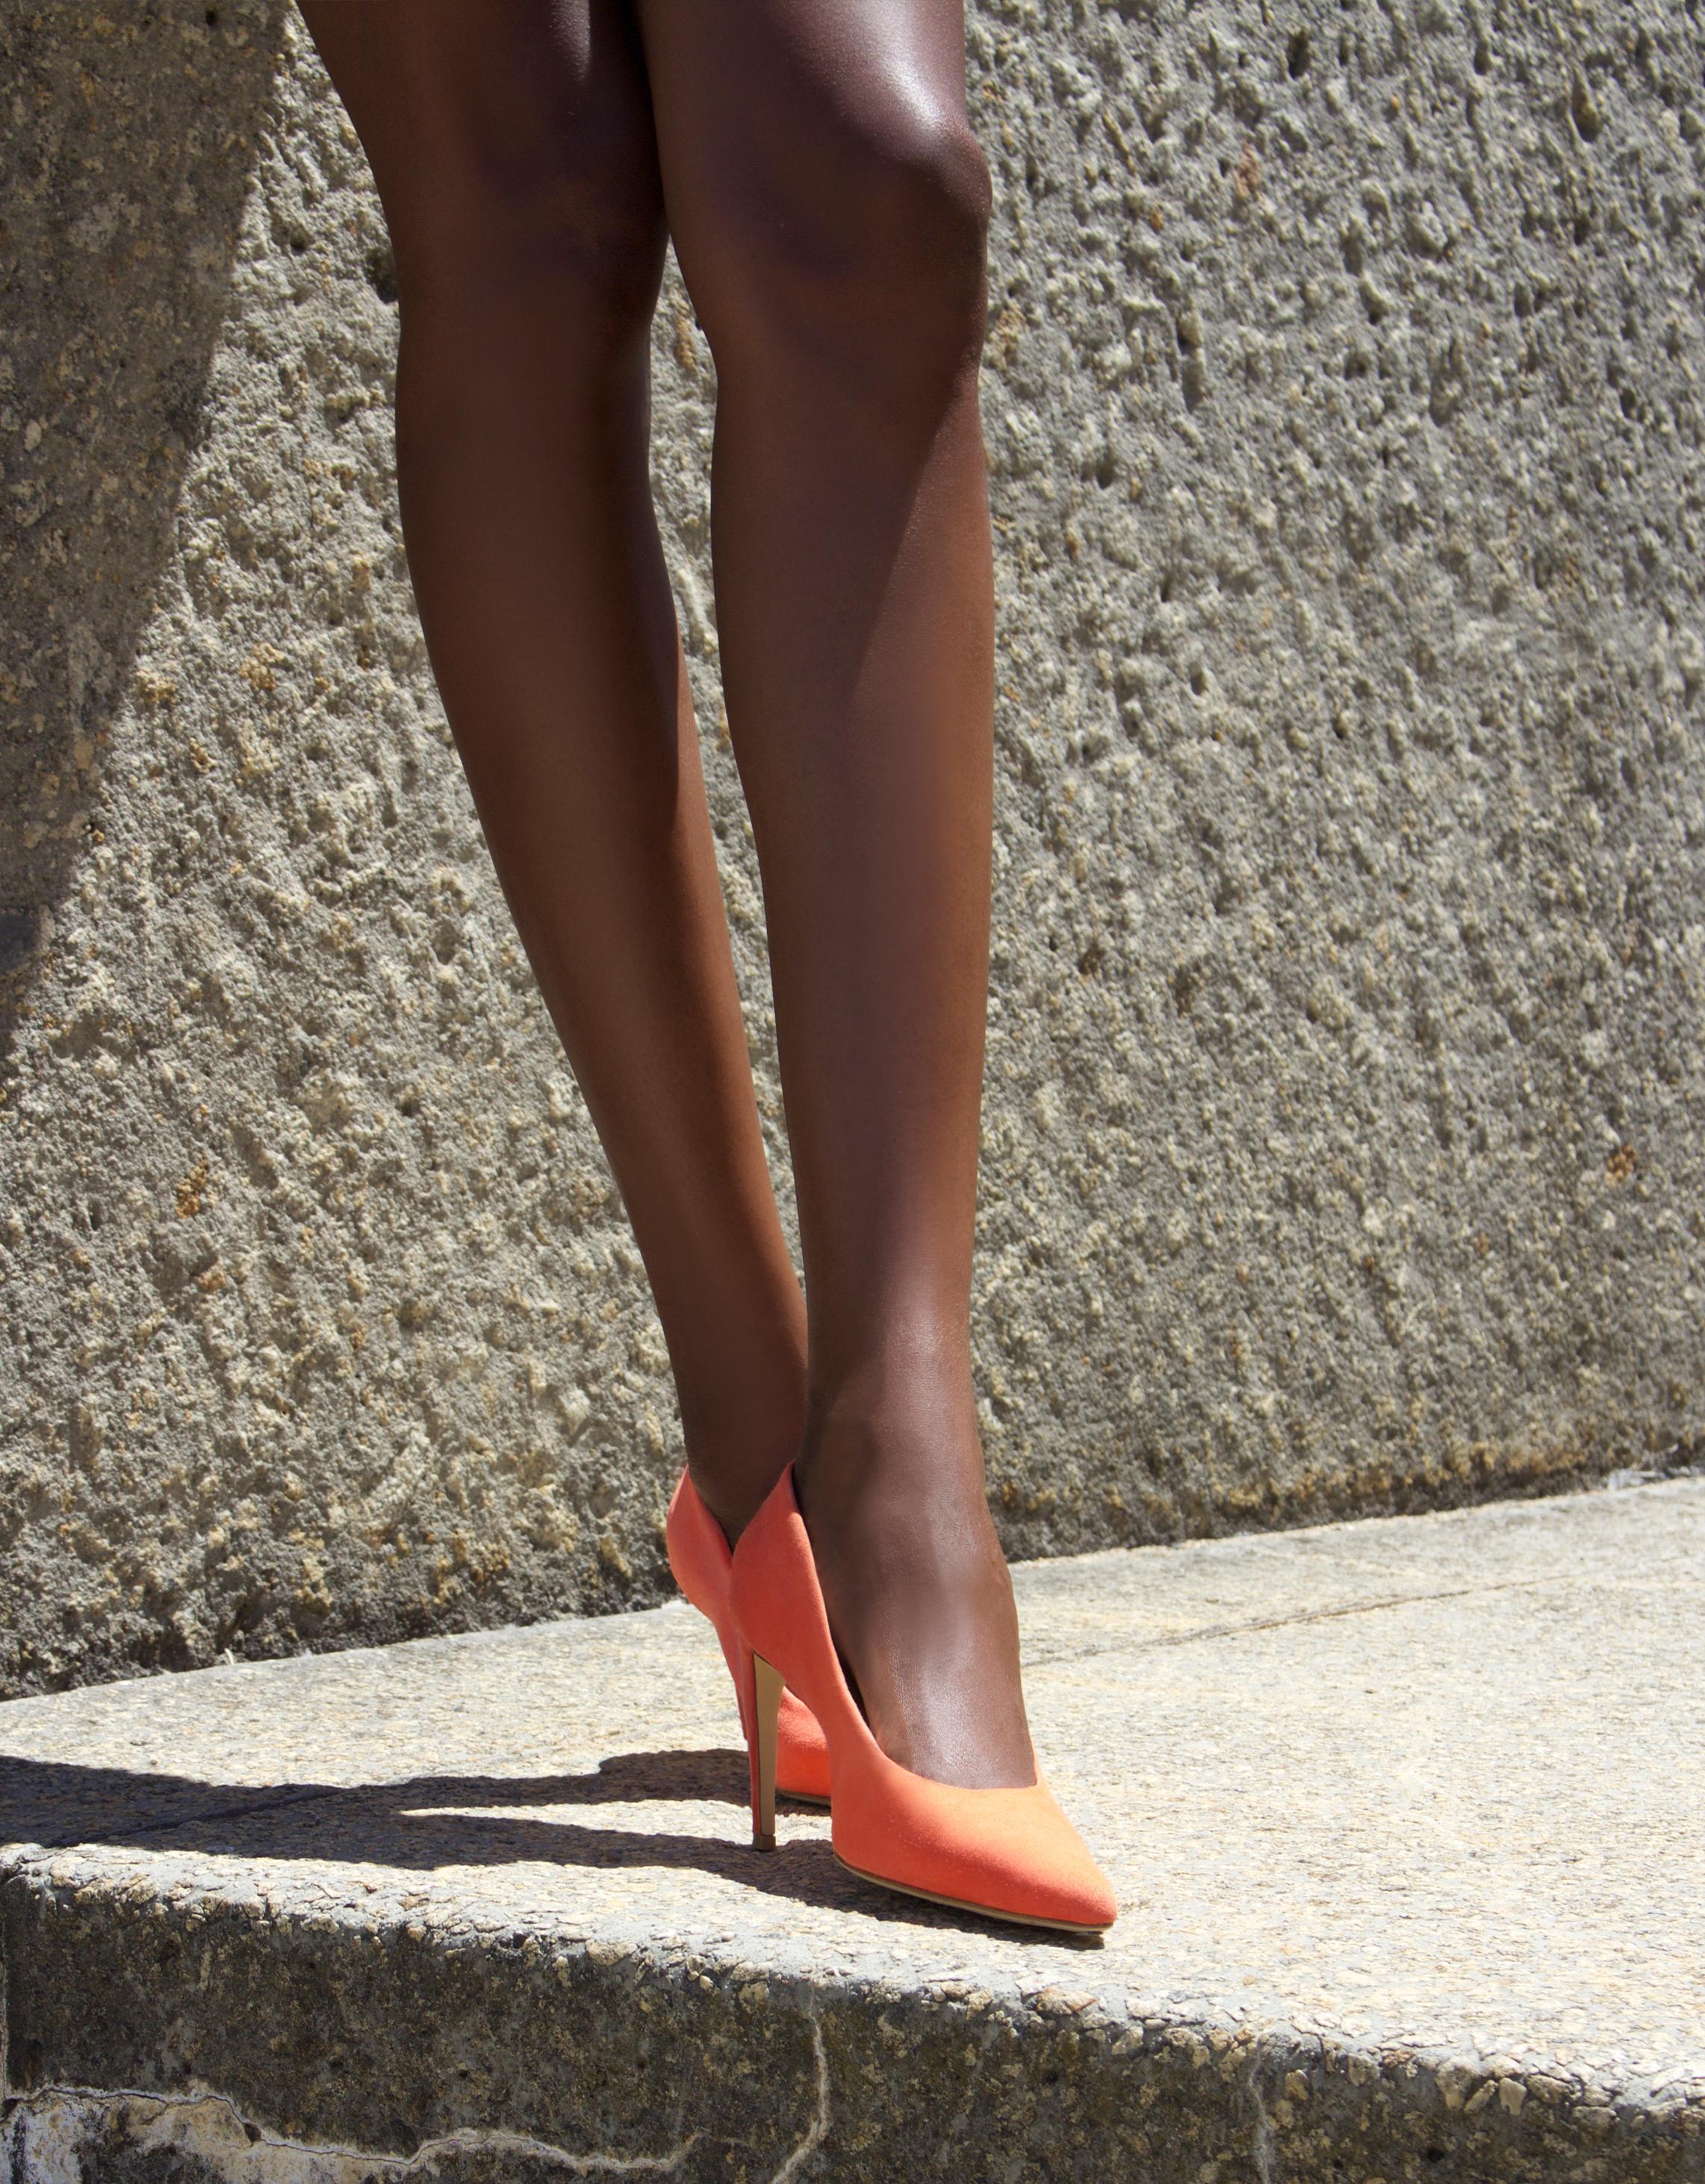 red orange feraggio high heels comfy comfortable pumps stilettos pony hair print high end quality handcrafted craftsmanship sale